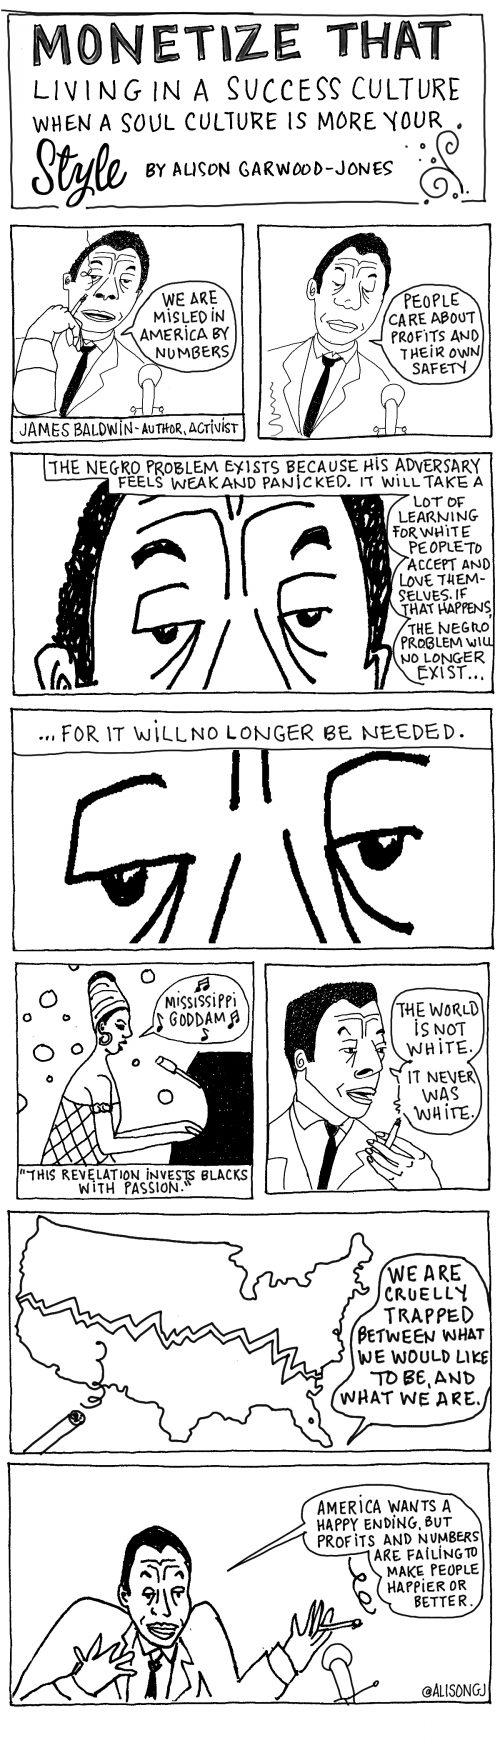 James Baldwin cartoon by Alison Garwood-Jones